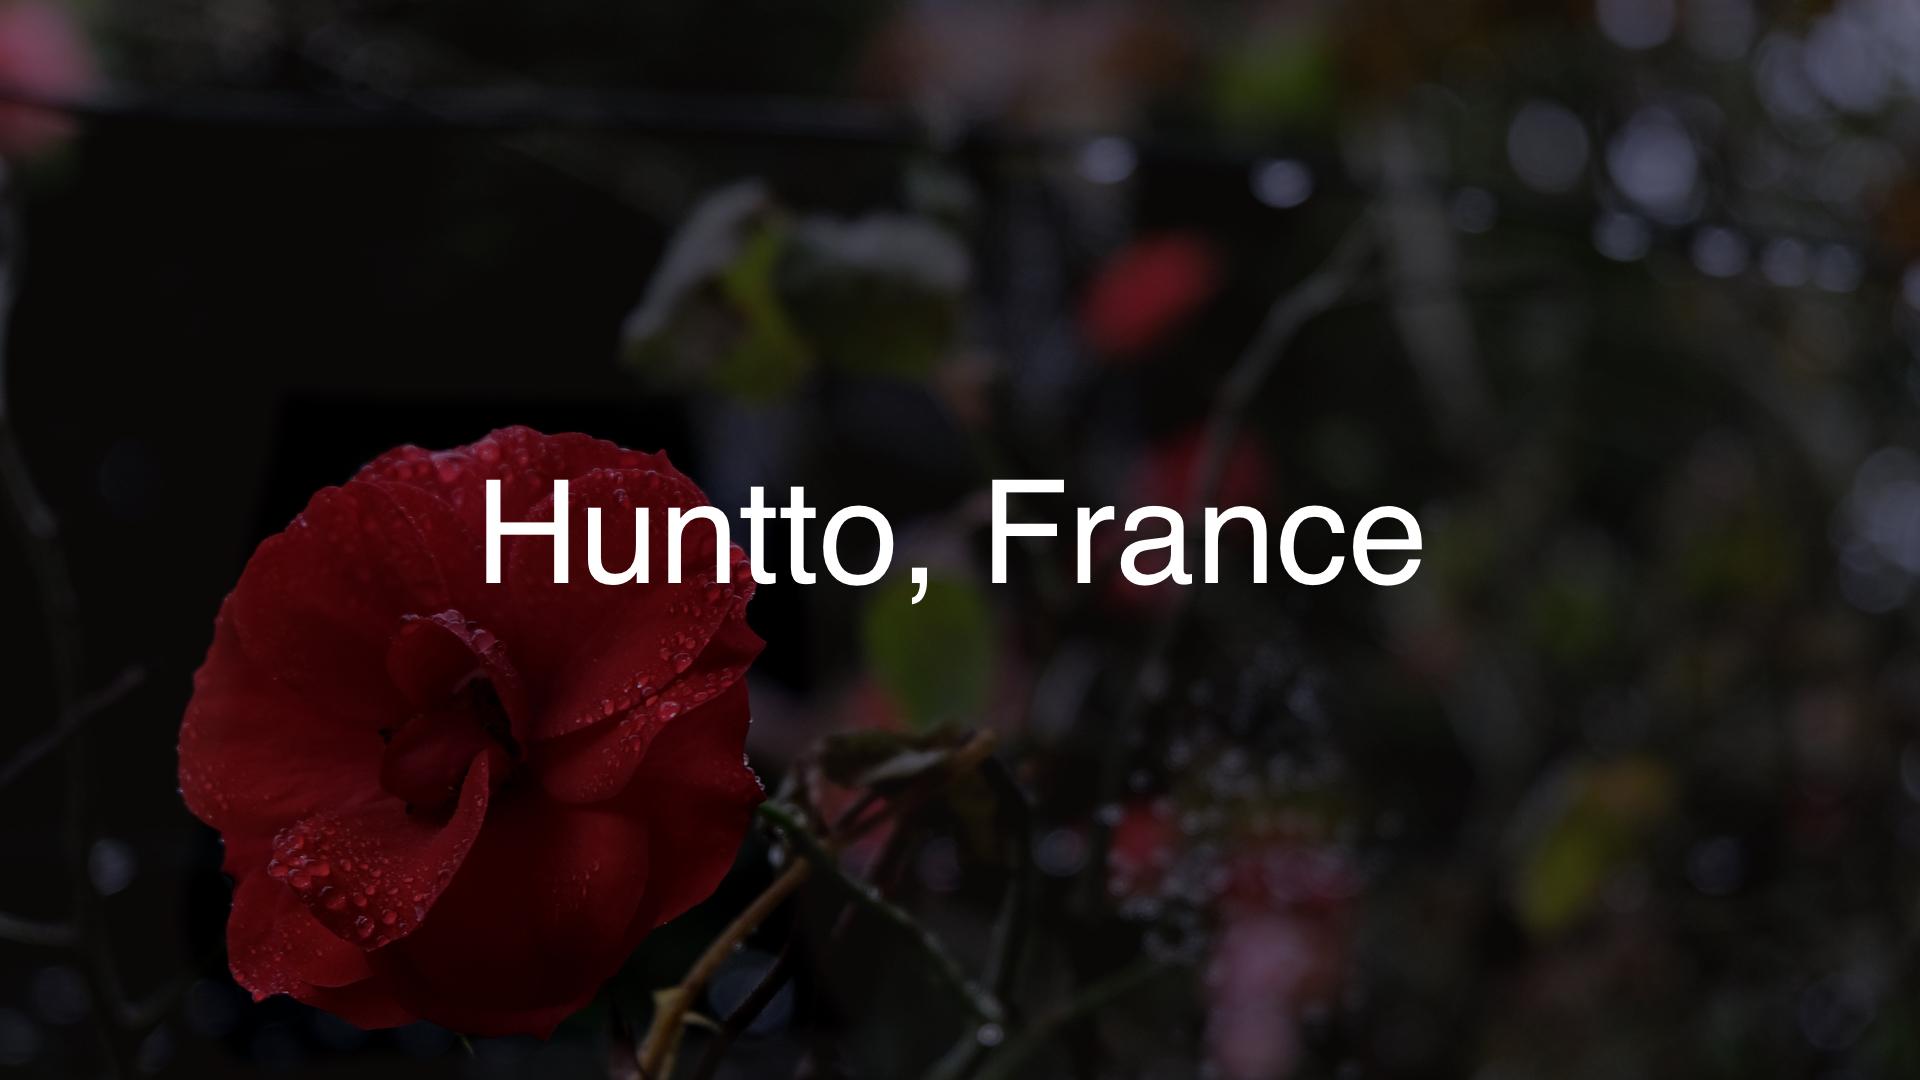 Huntto 1920x1080 dark